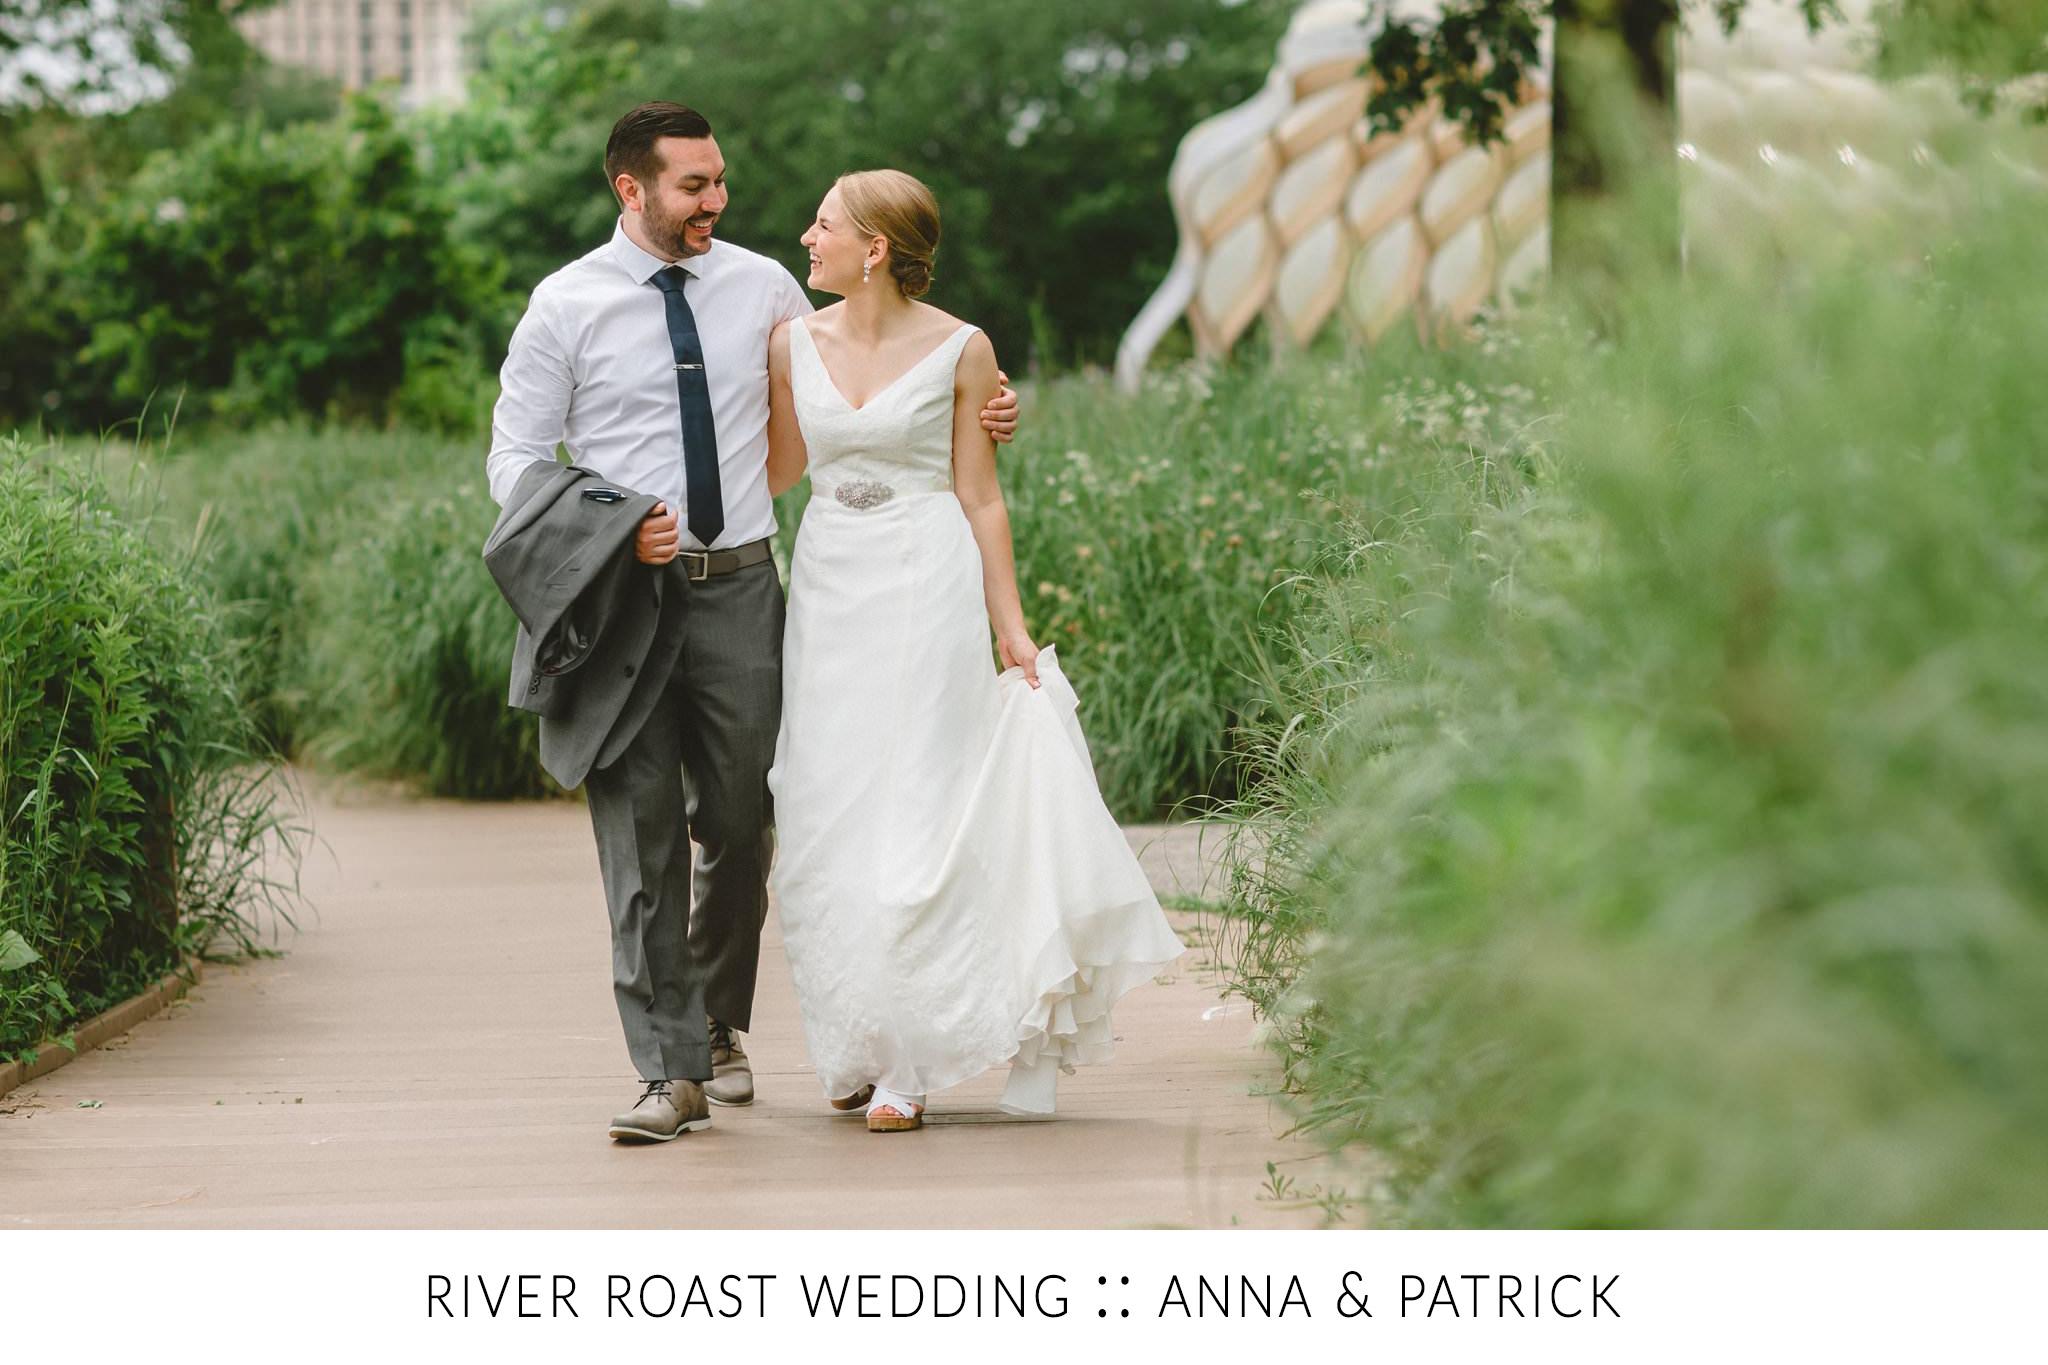 River Roast Wedding